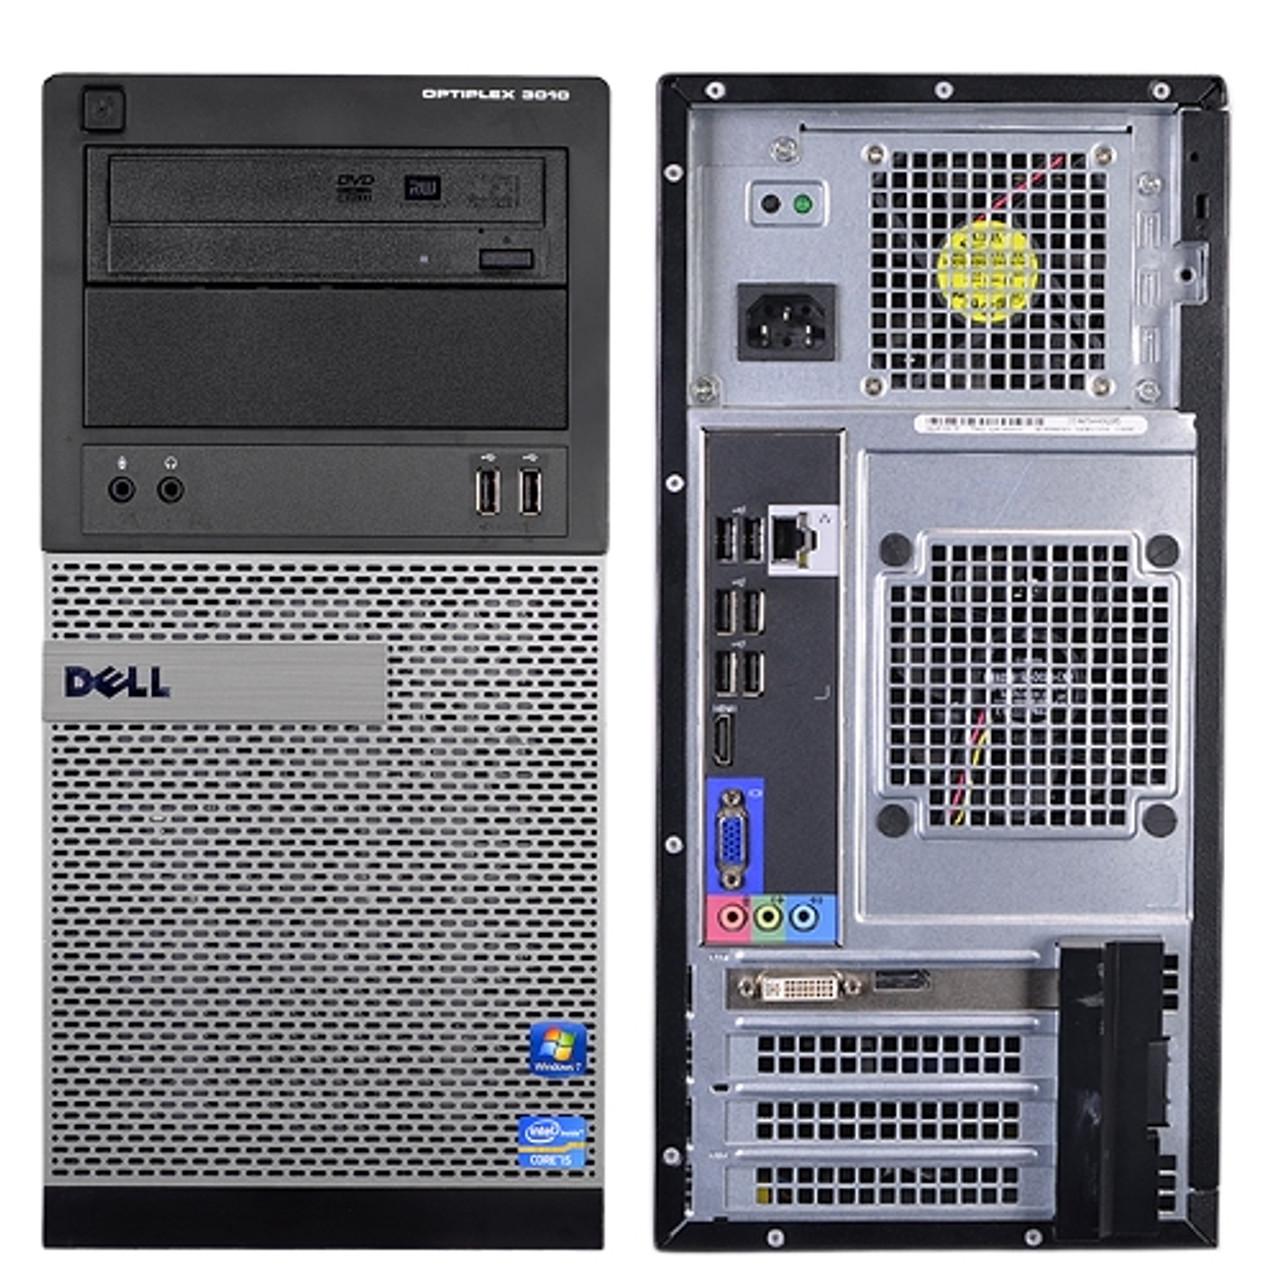 Dell Optiplex 3010 i5 SFF Desktop Computer - Refurbished